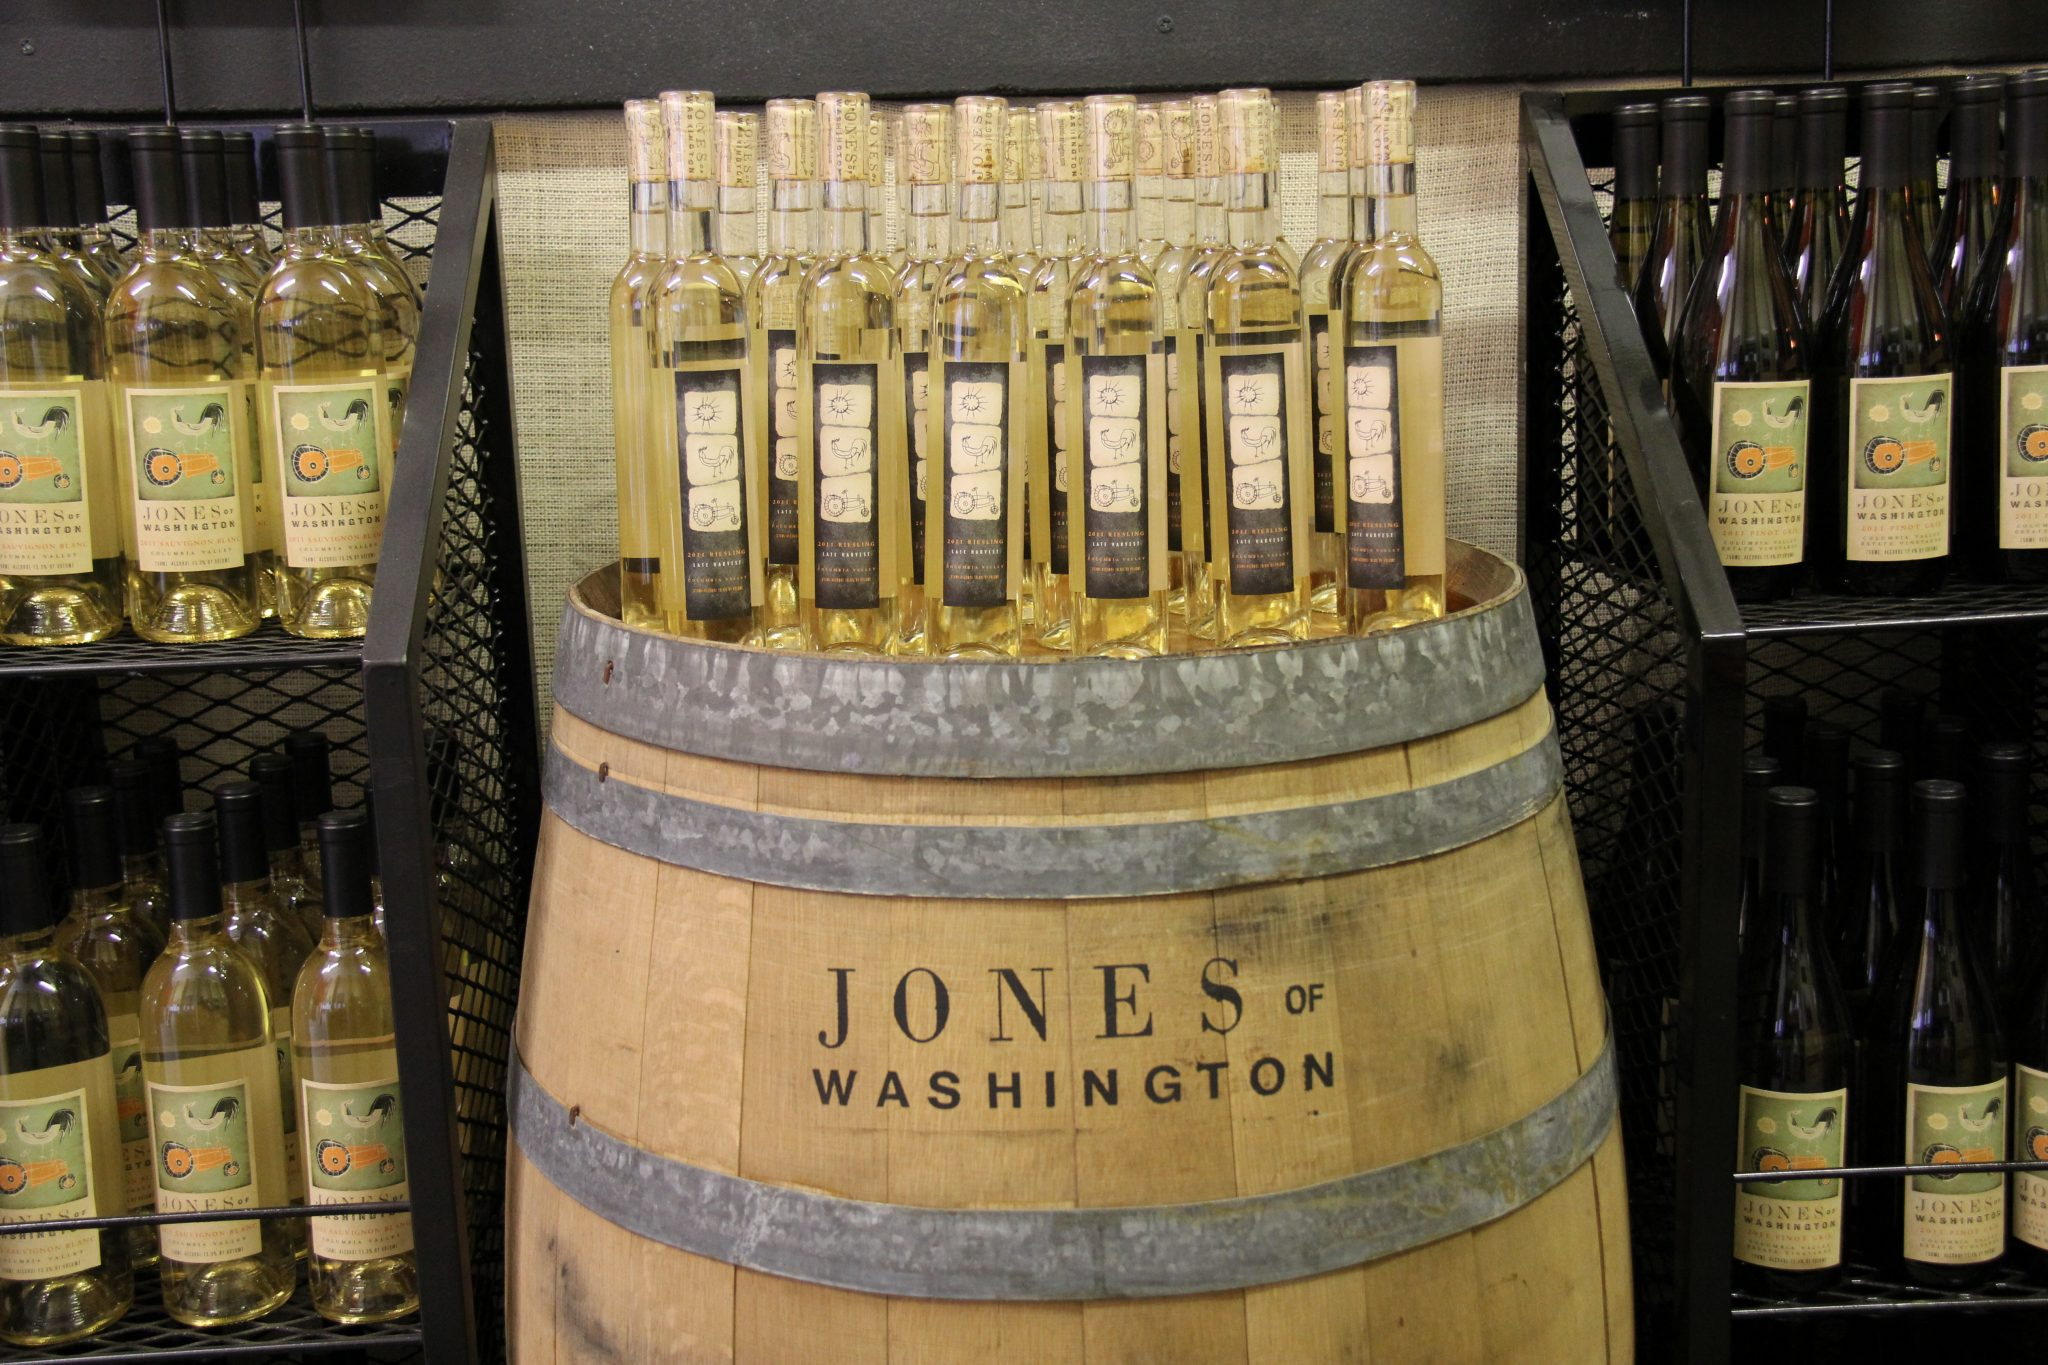 Jones of Washington